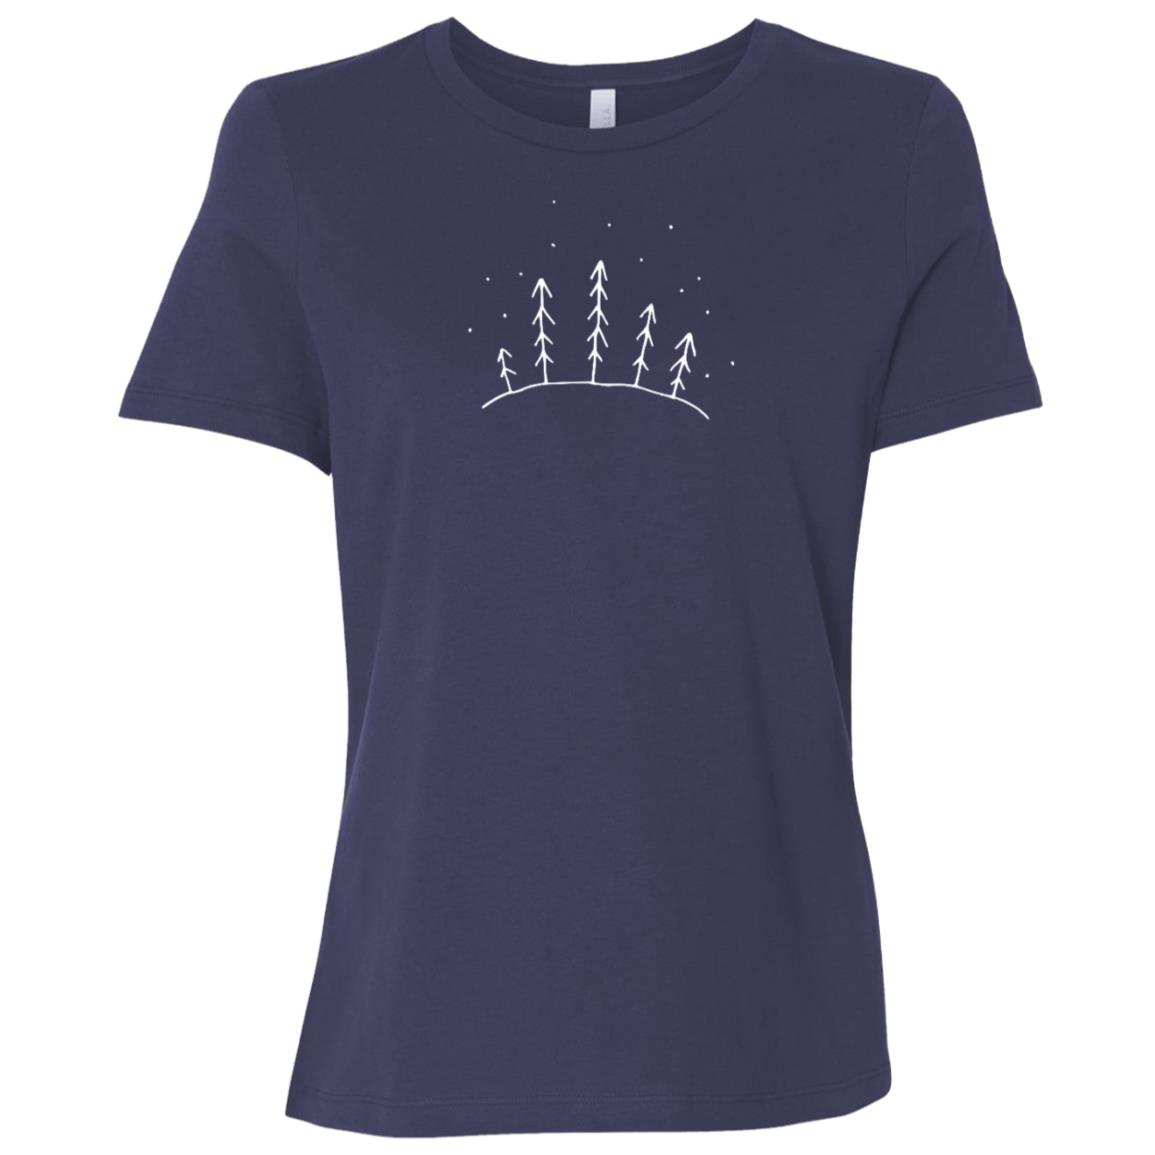 Minimalist Forest Hiking & Climbing Gift Women Short Sleeve T-Shirt